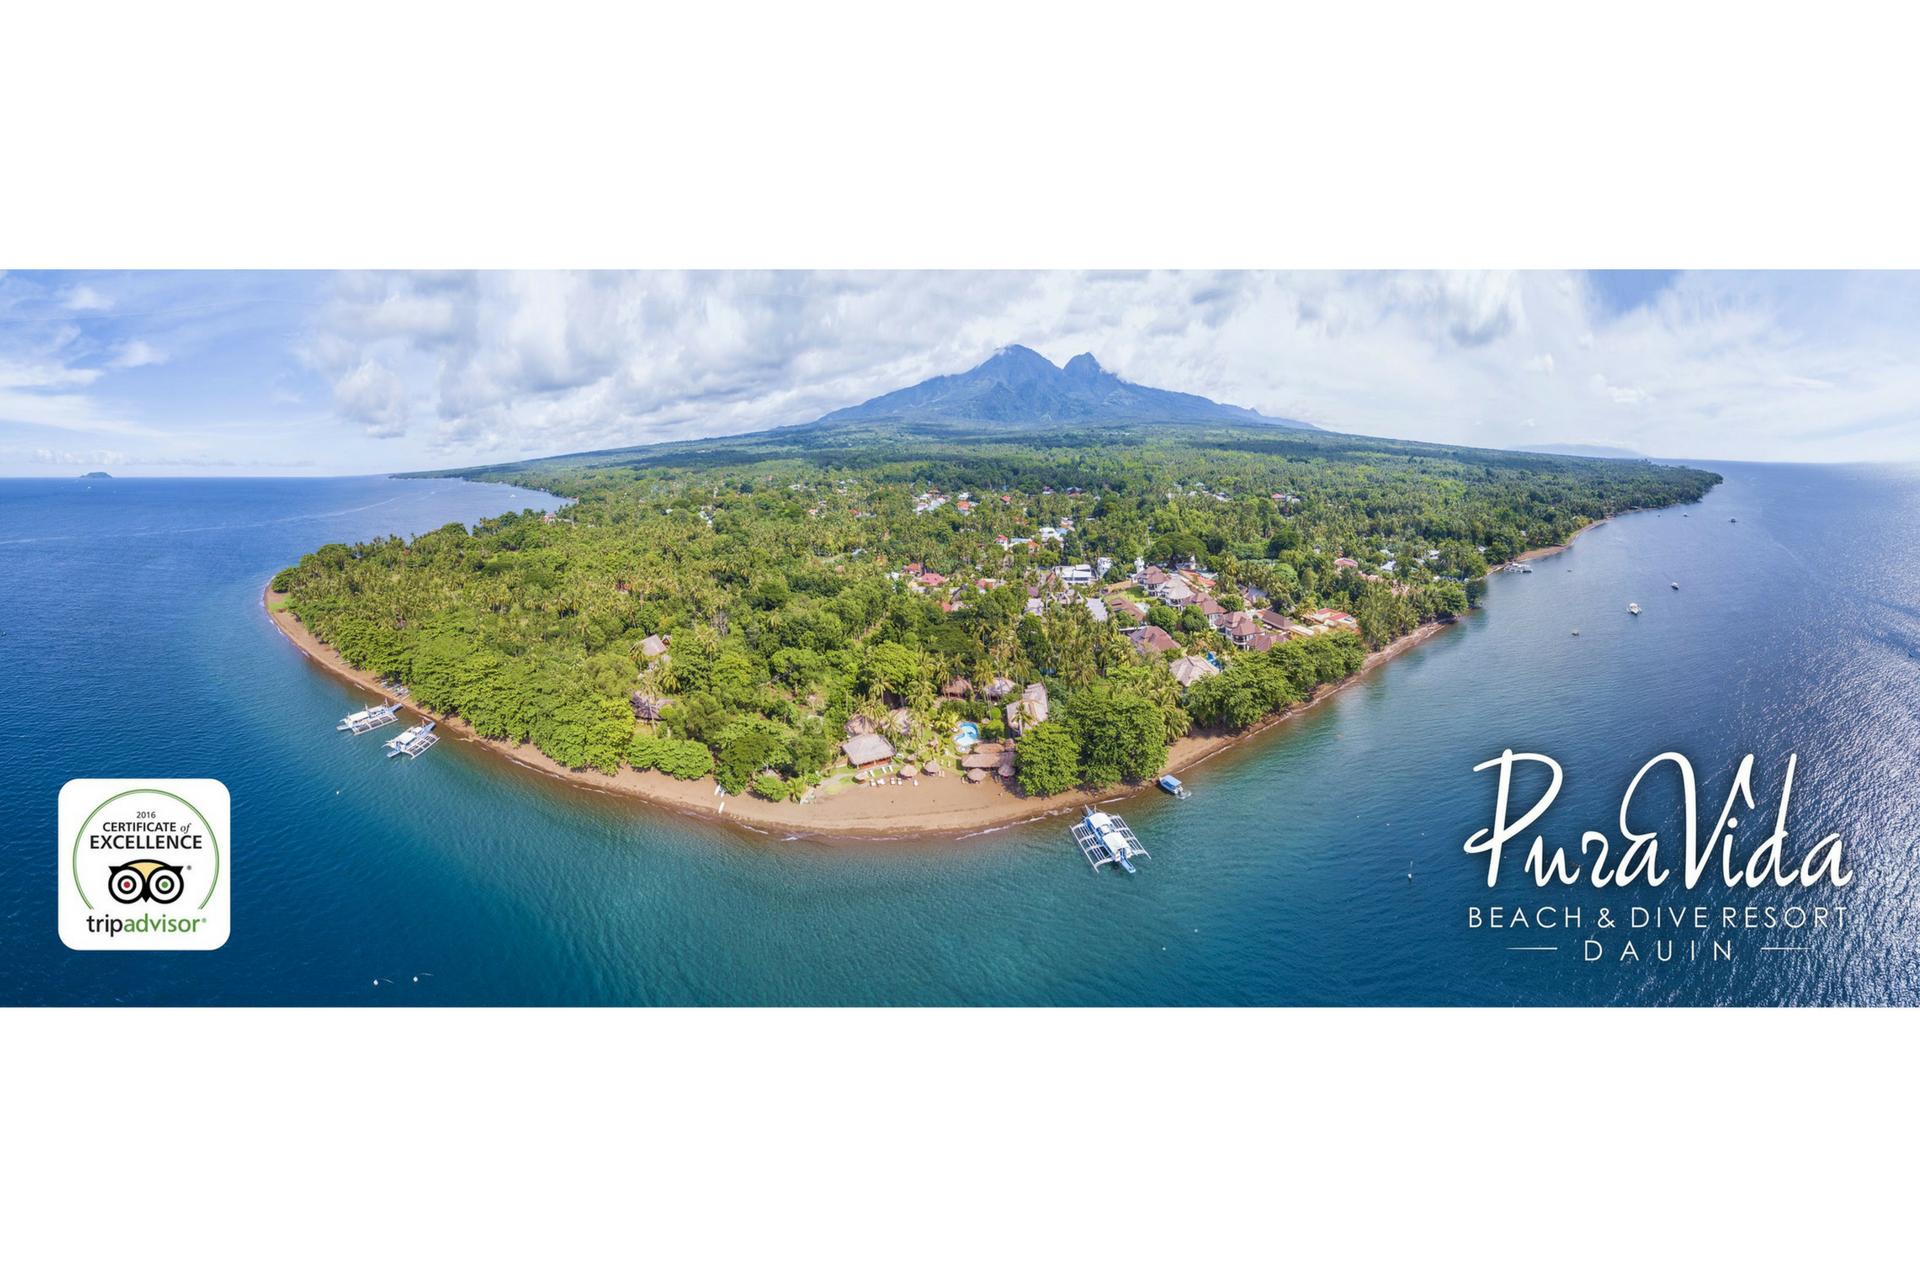 Pura Vida Beach Dive Resort